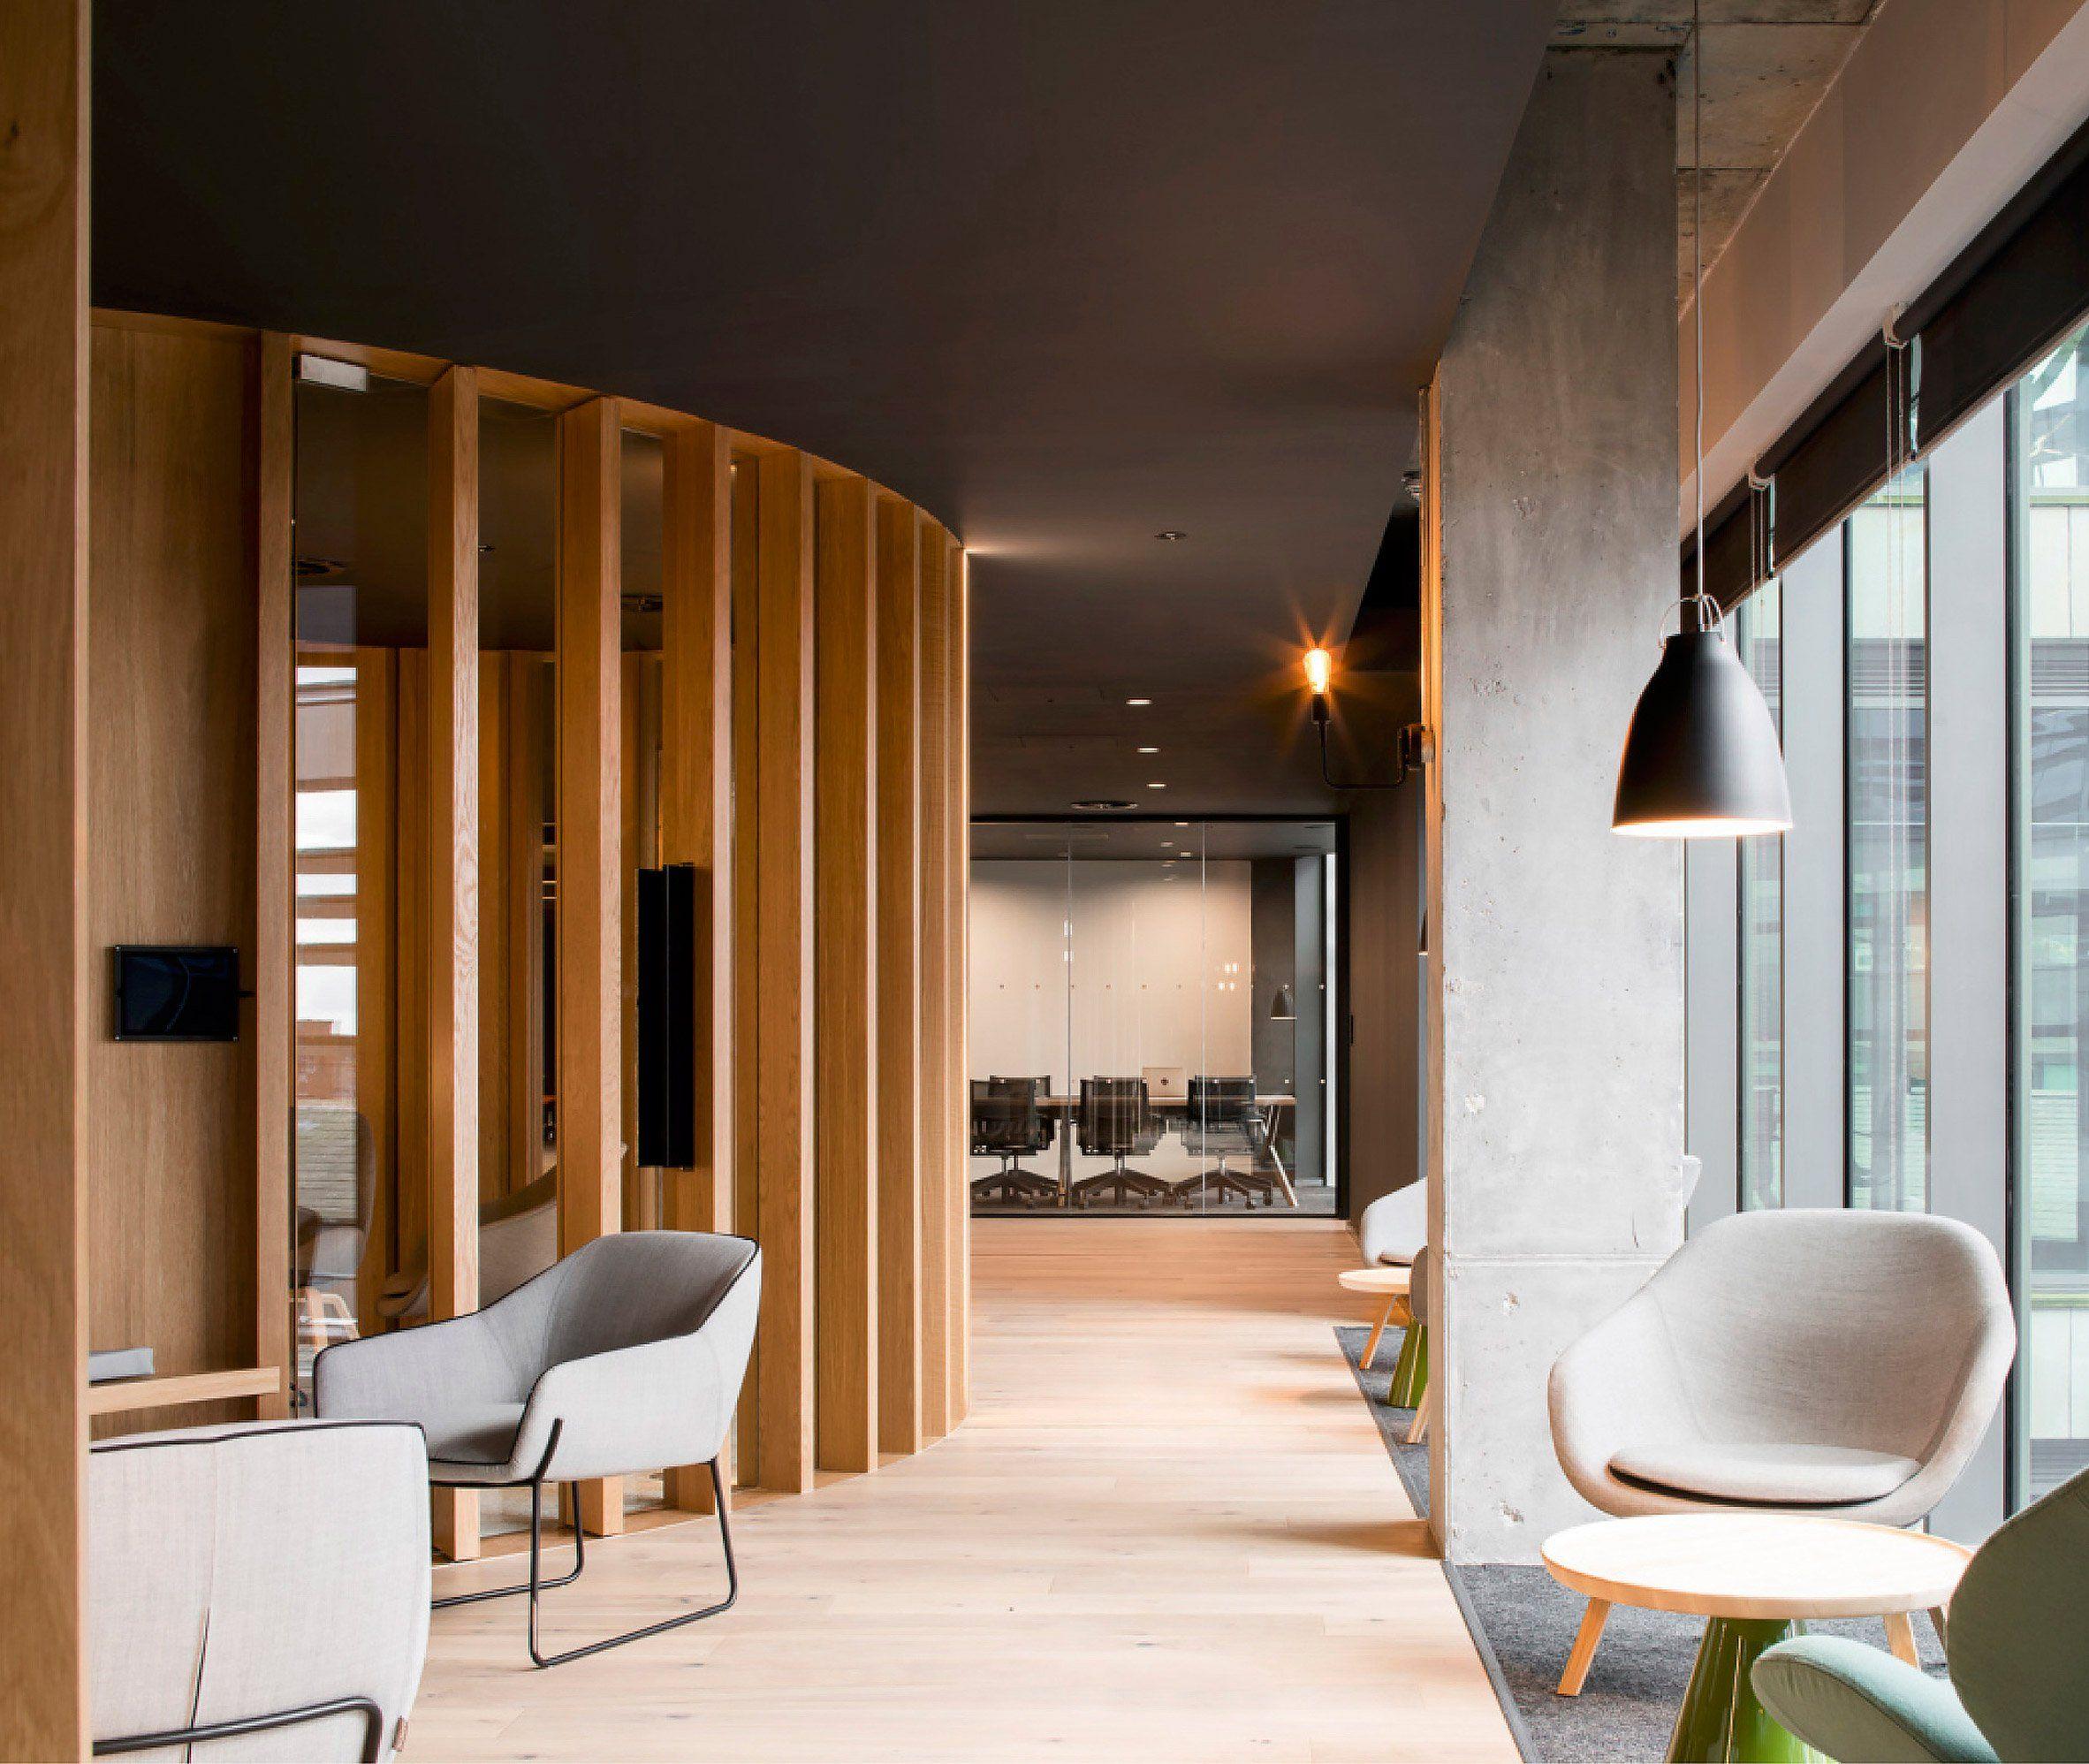 slack european hq office. the san francisco-based company opened a